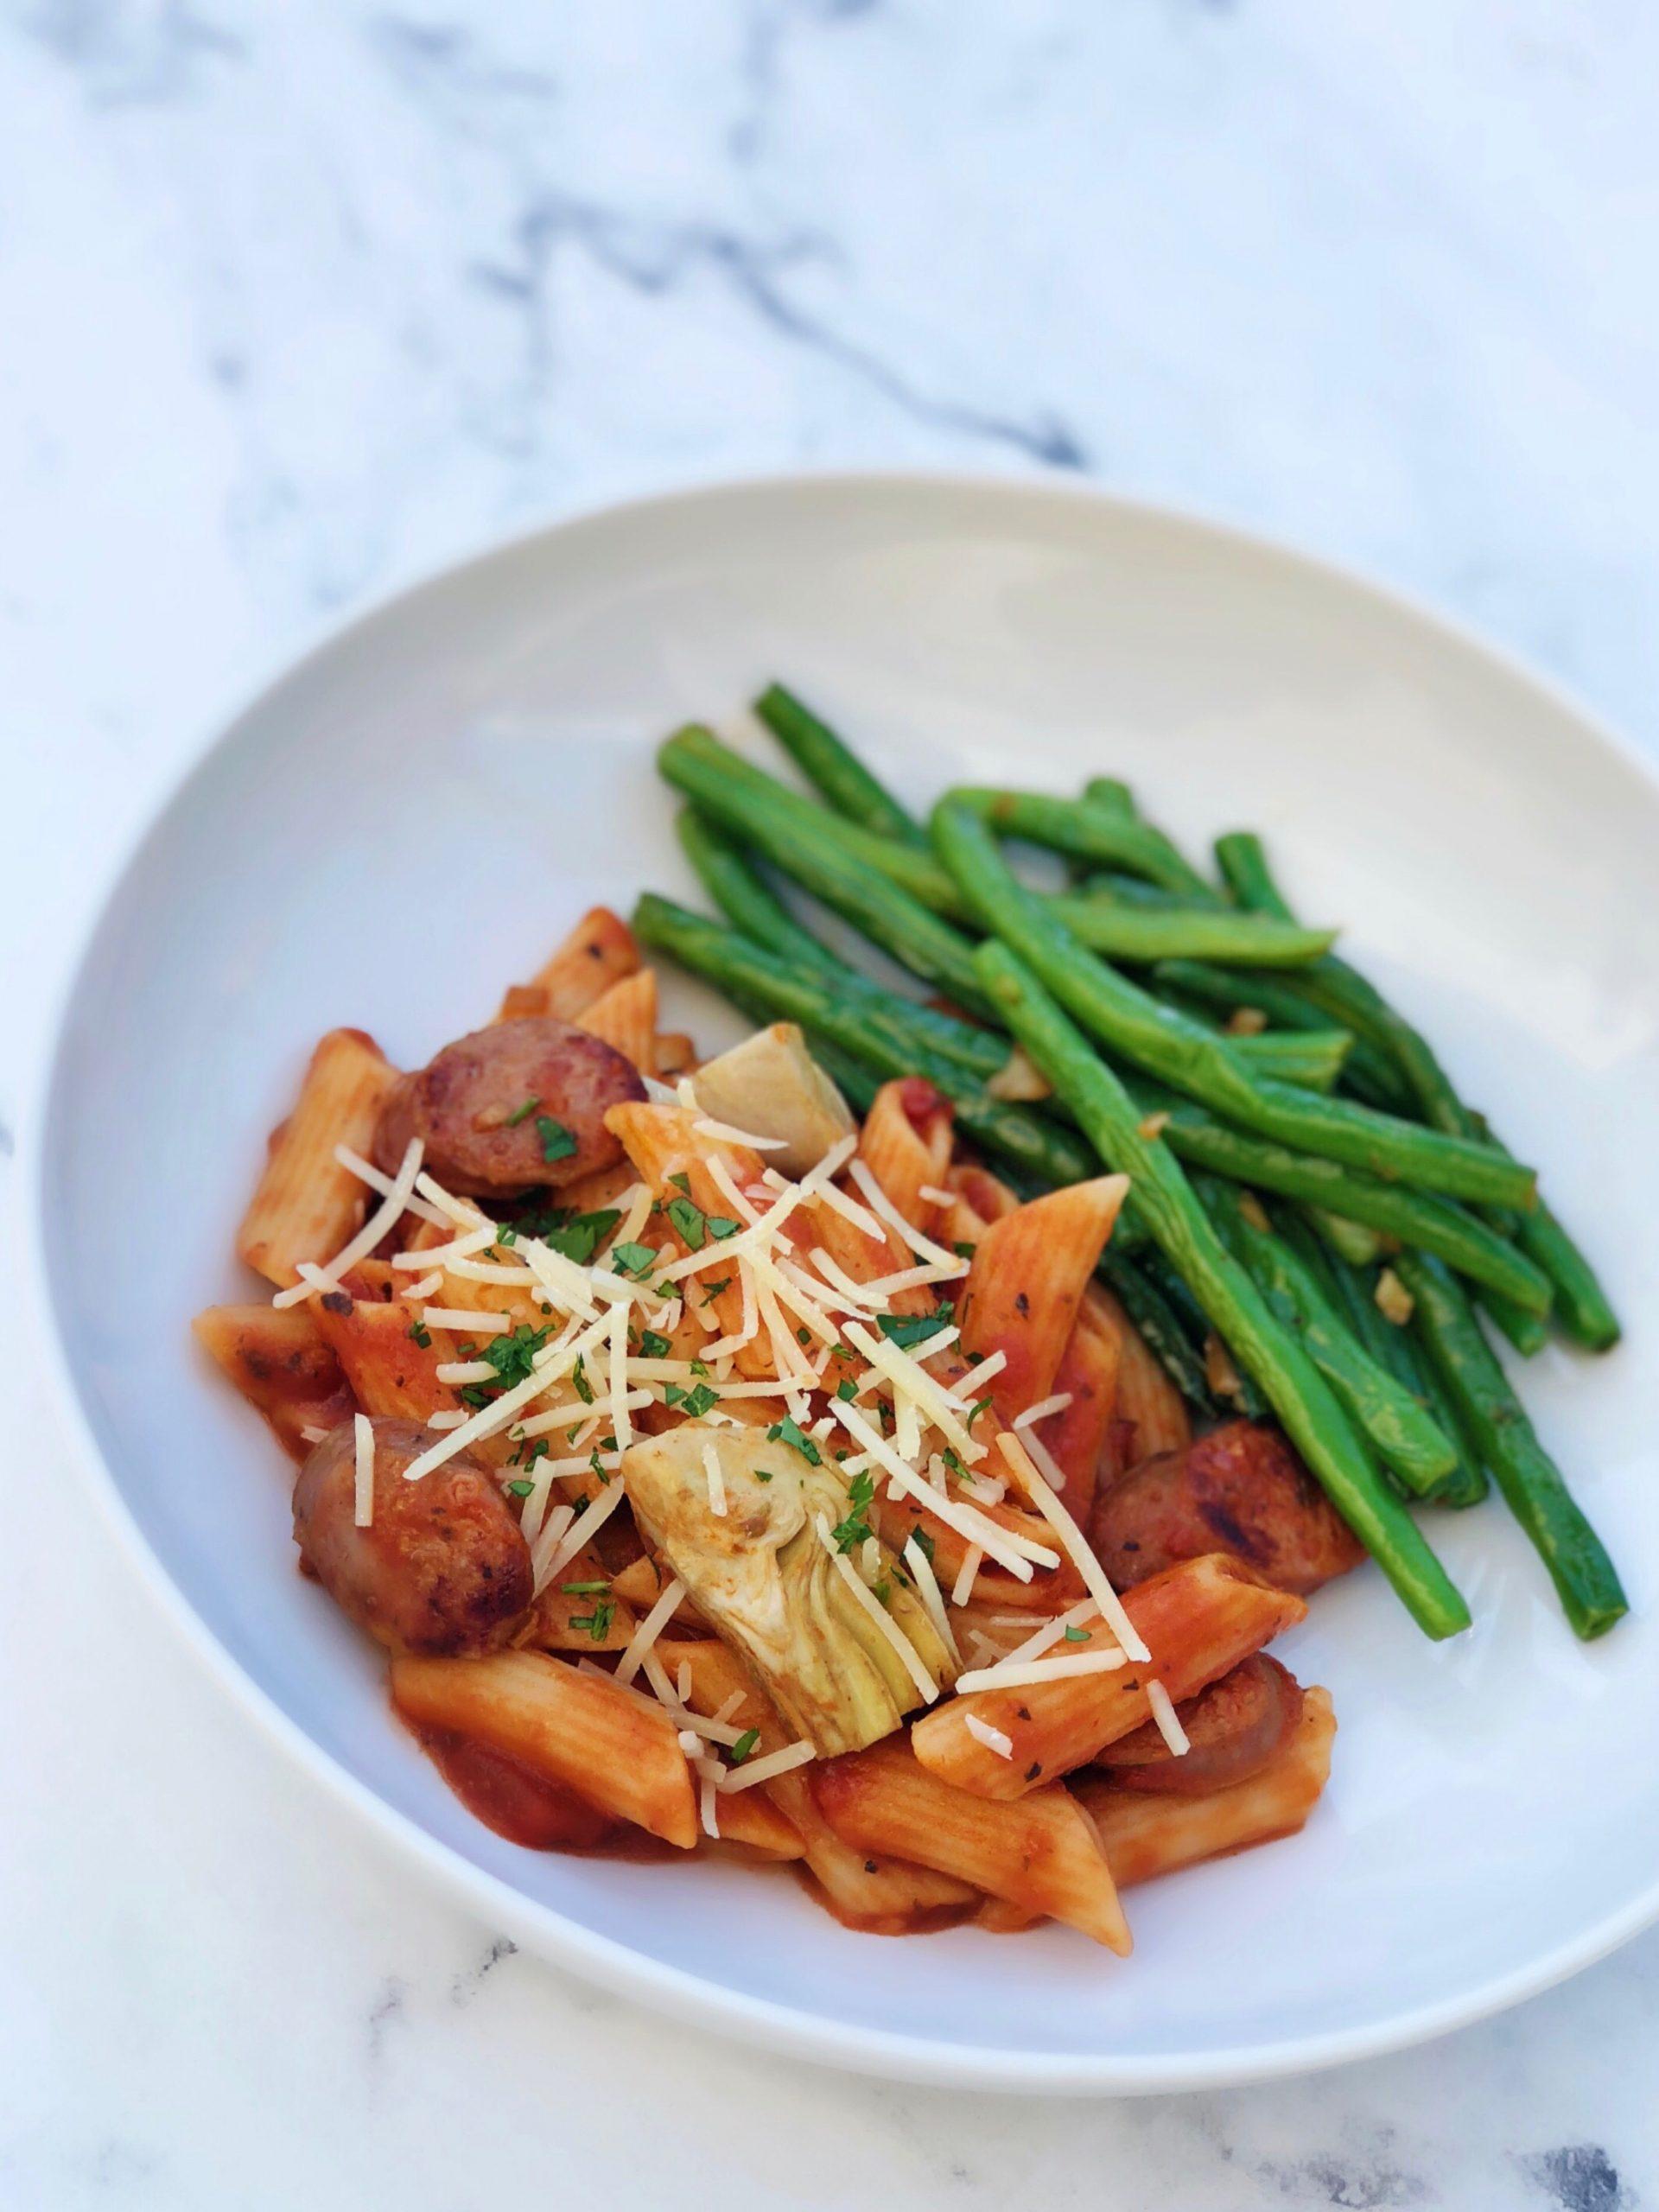 Sausage Pasta with Garlic Green Beans